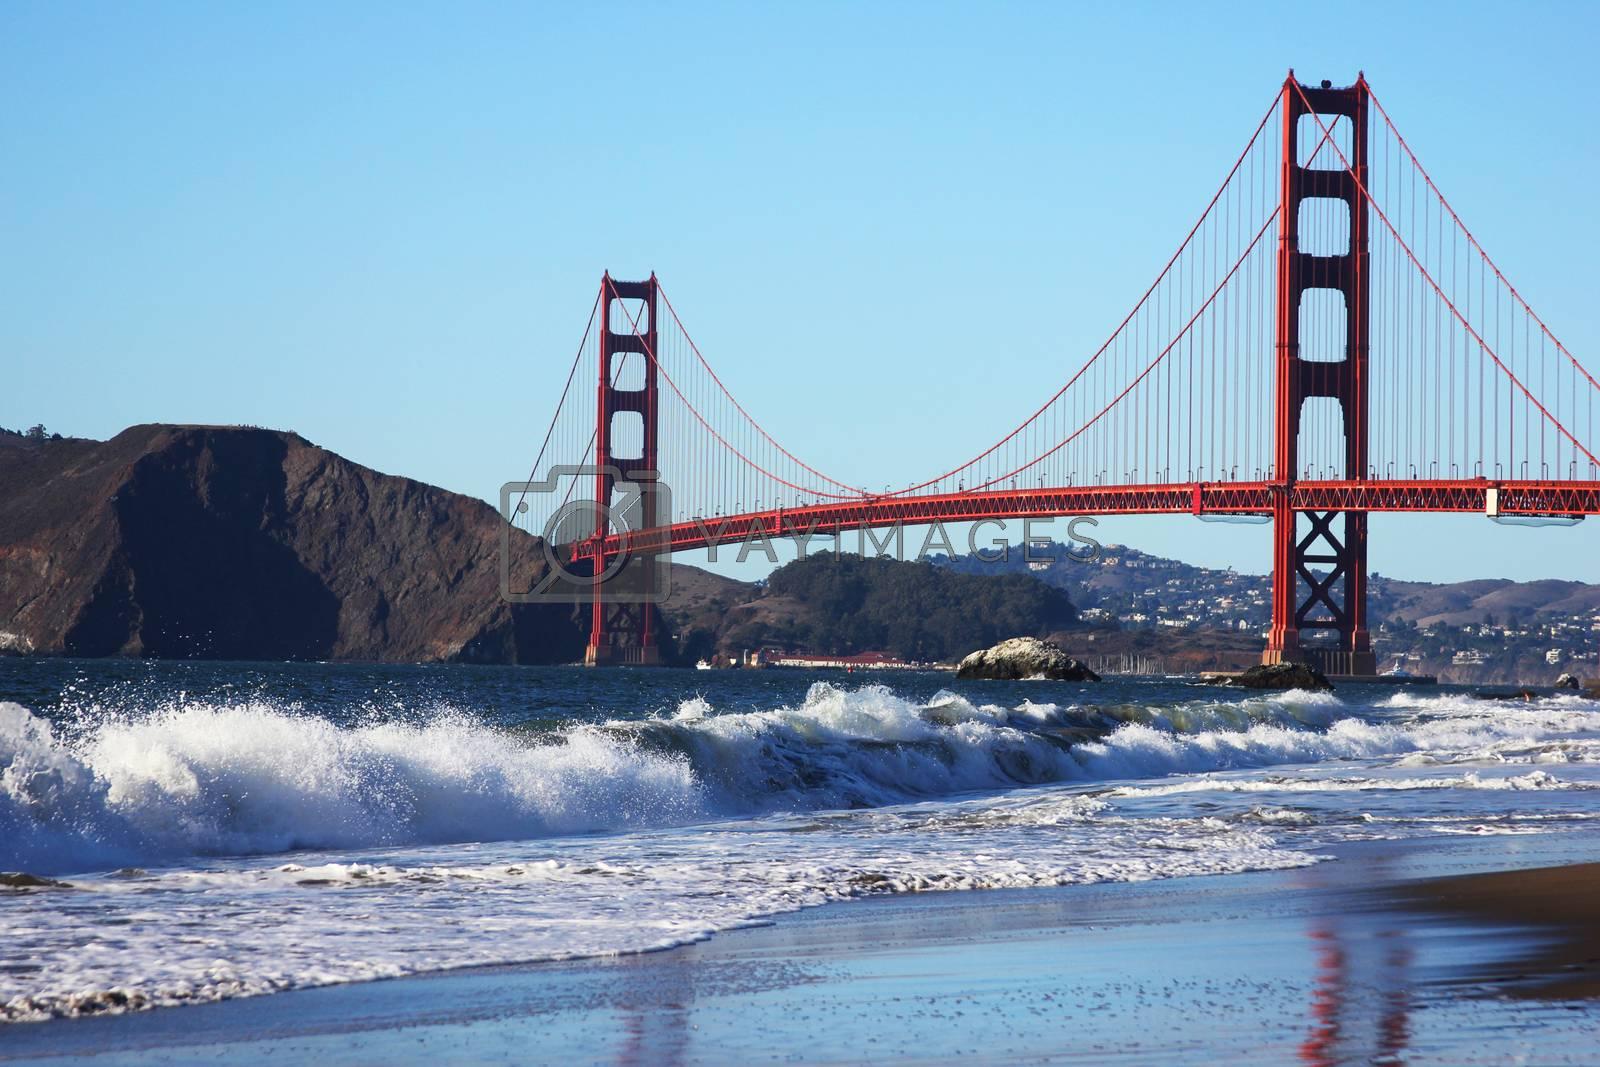 Baker Beach underneath the Golden Gate Bridge in San Francisco. California